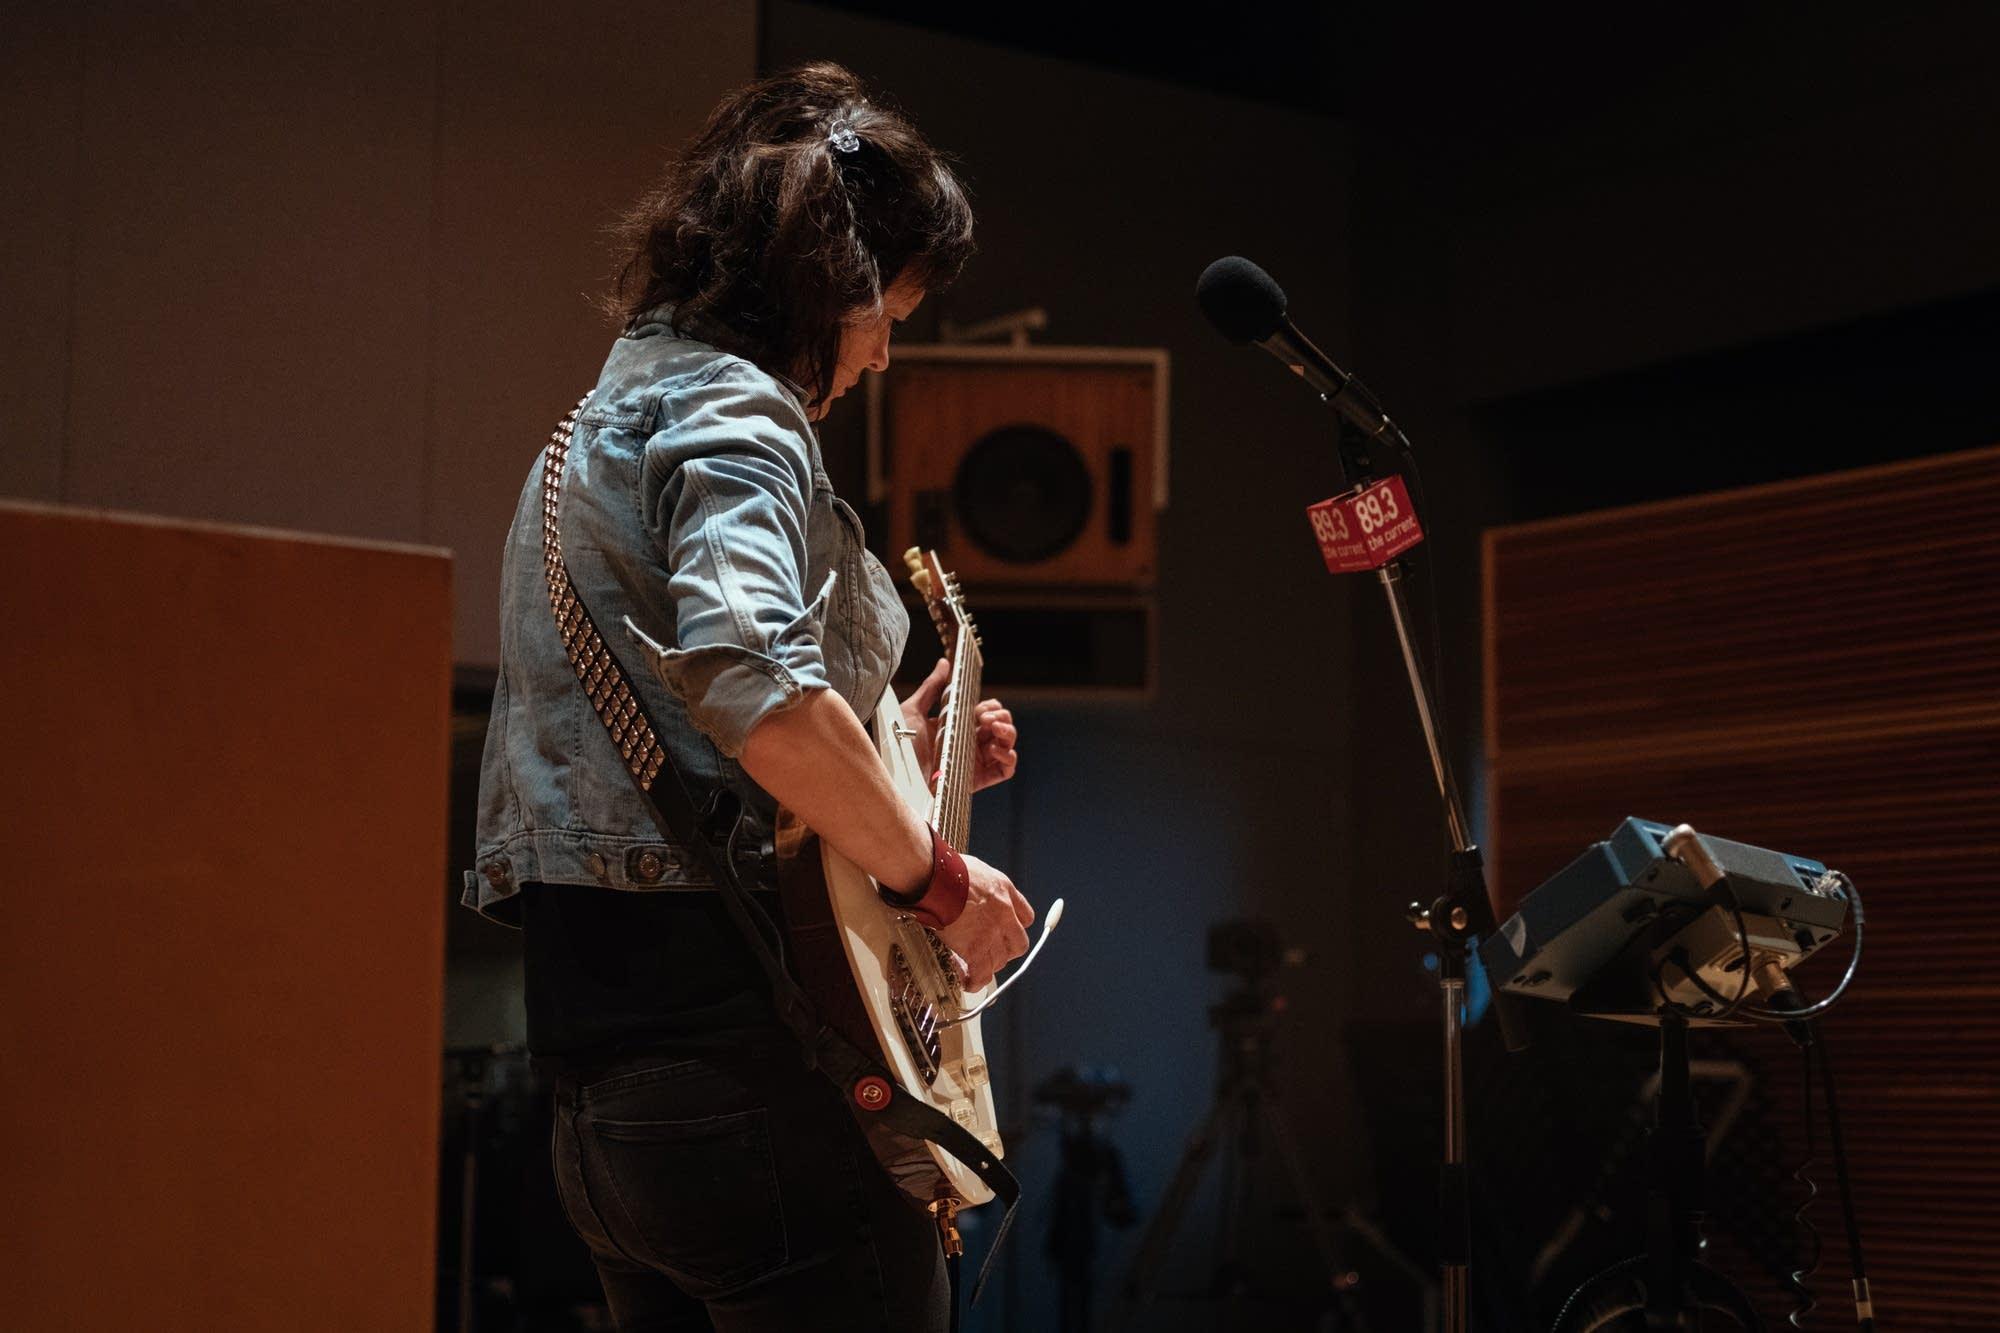 Ex Hex perform in The Current studio